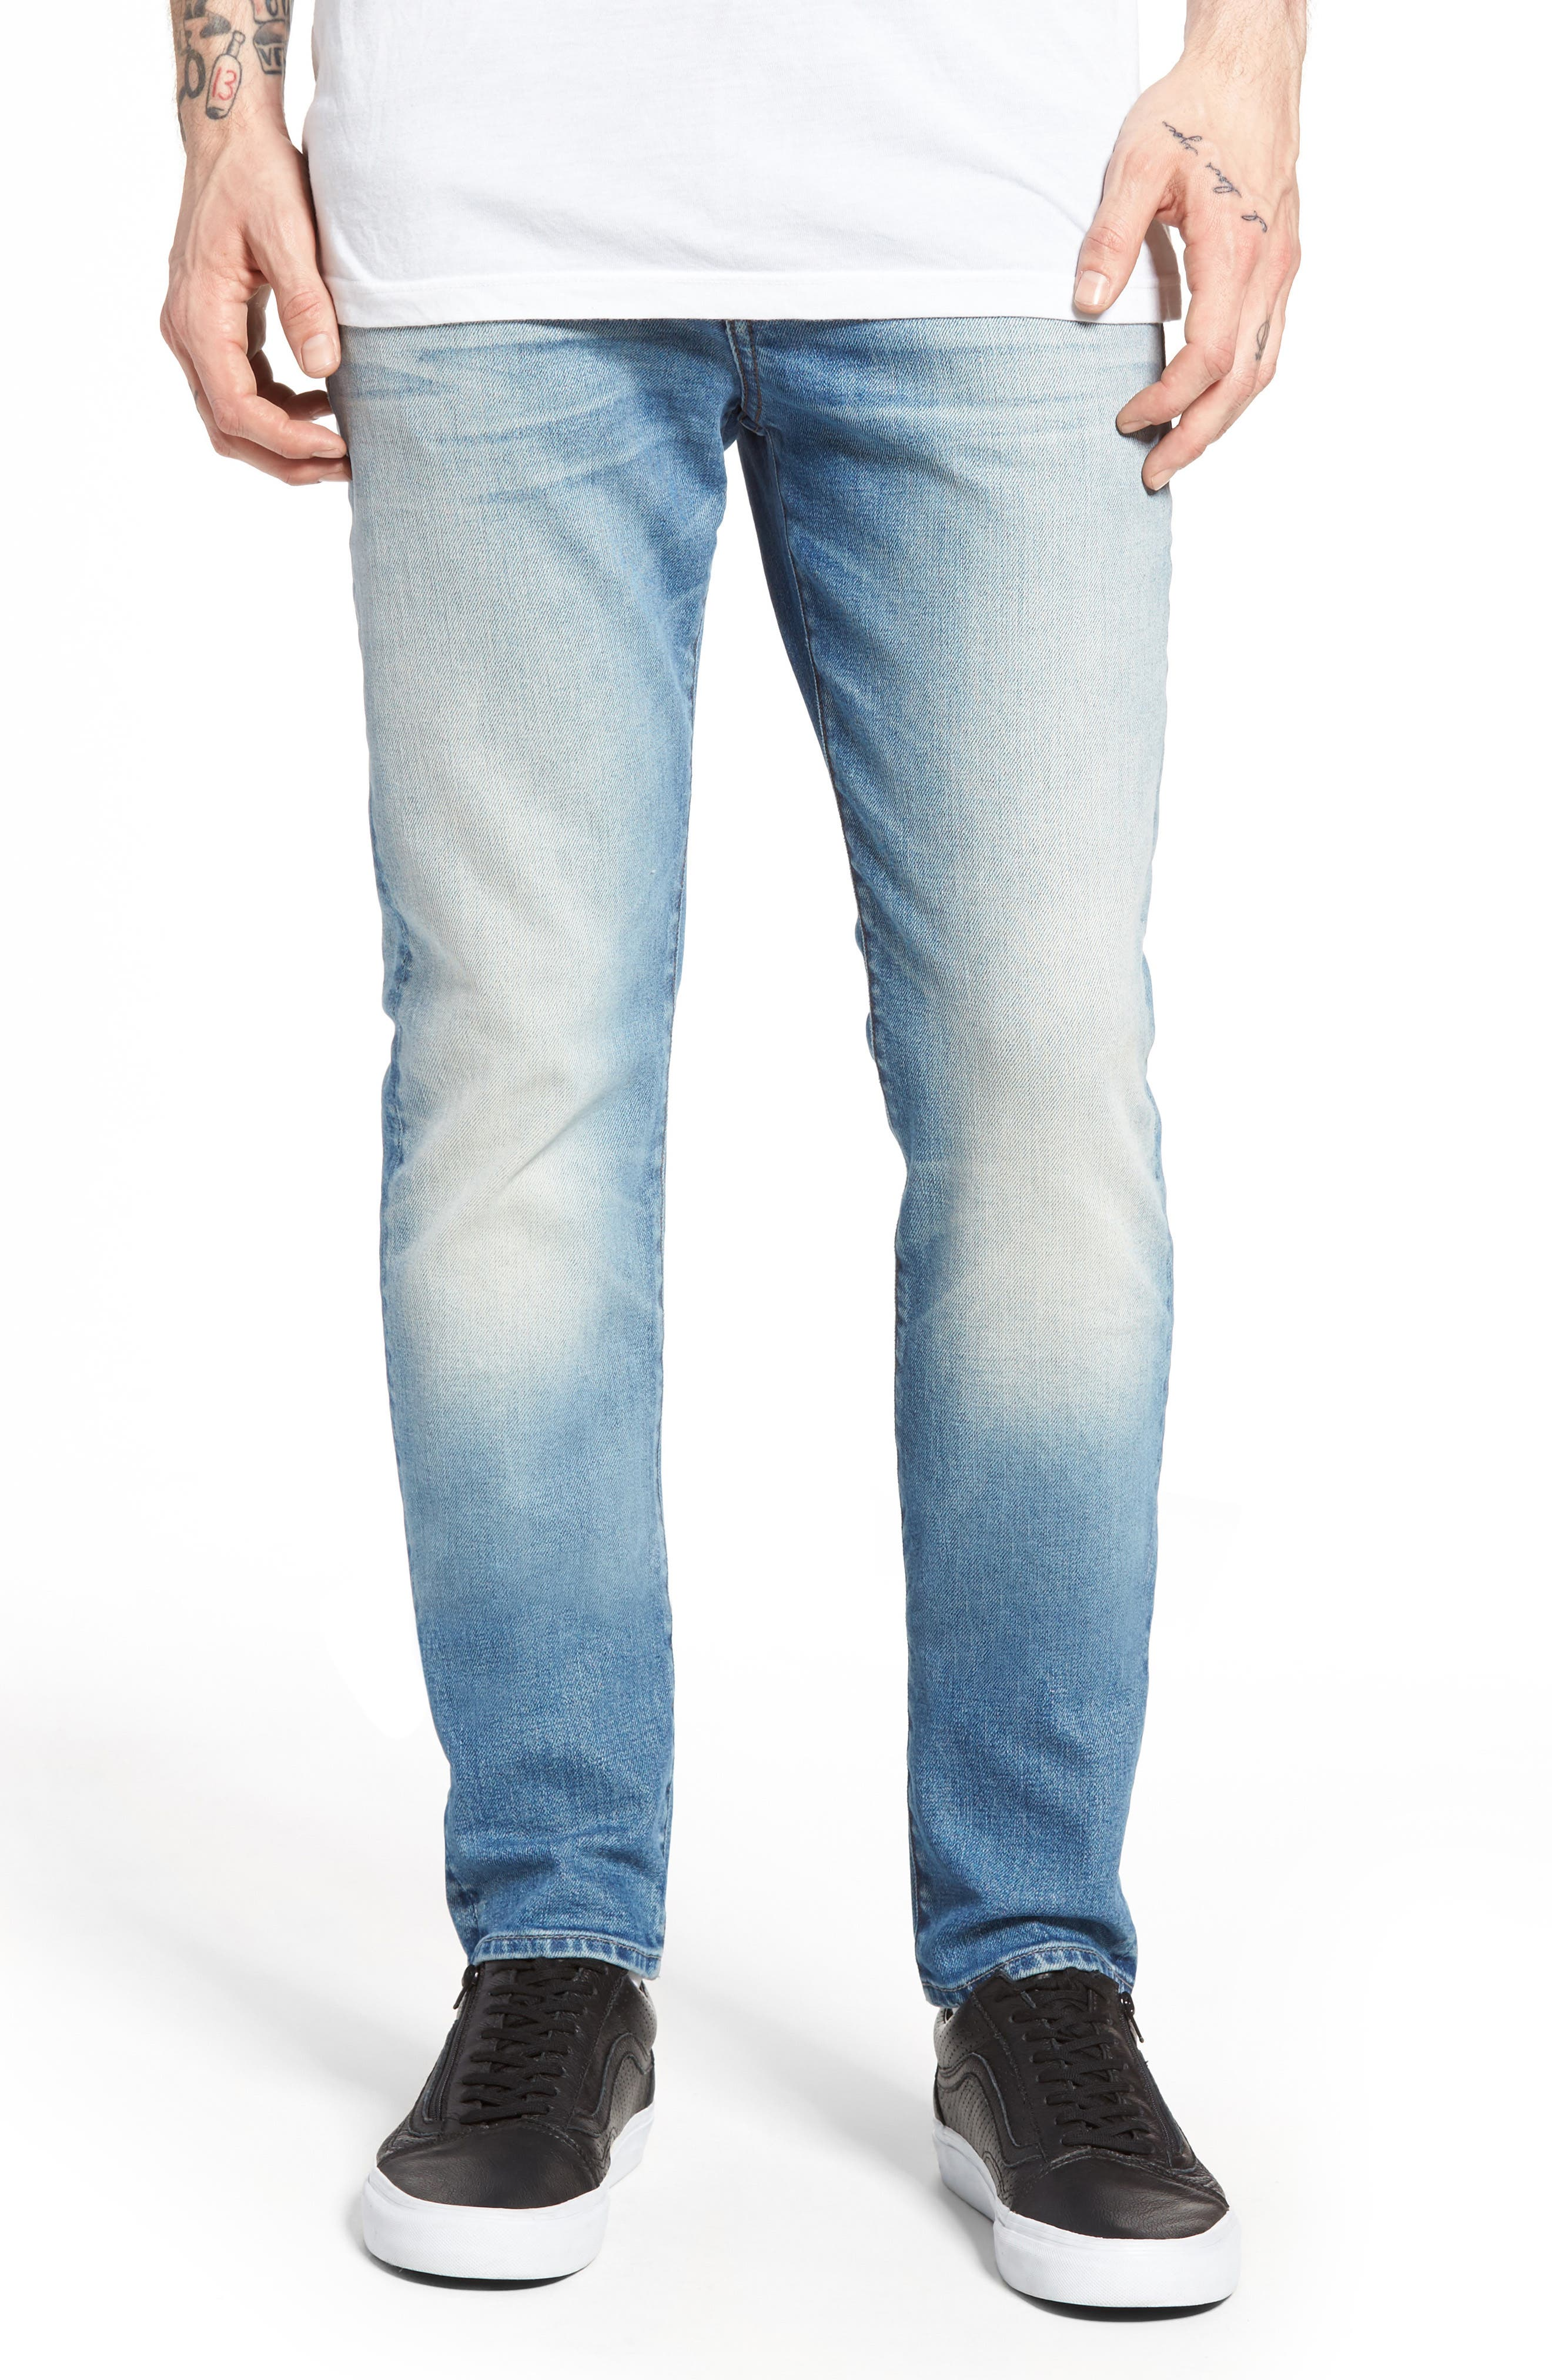 UB301 Straight Leg Raw Selvedge Jeans,                             Main thumbnail 1, color,                             INDIGO